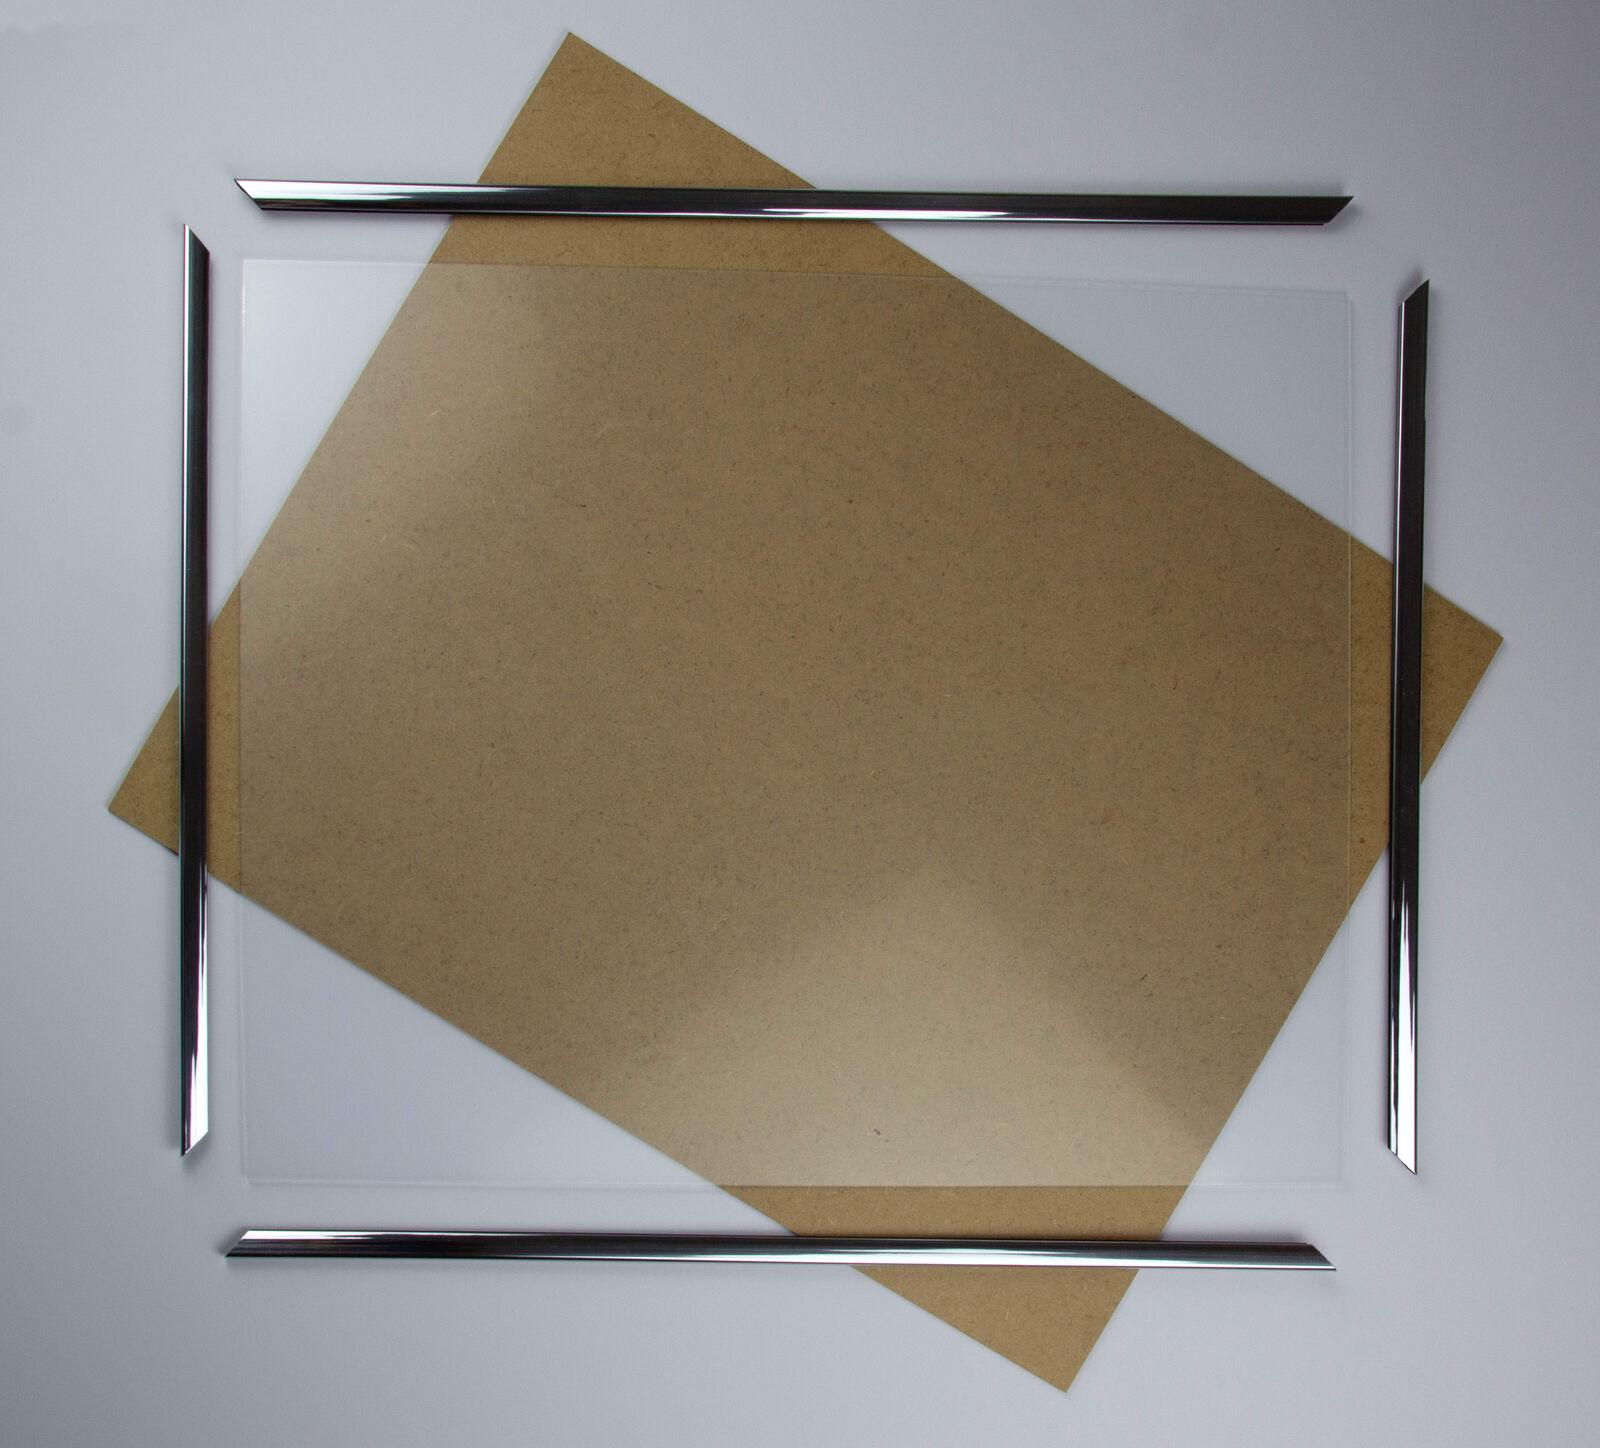 Kunststoff Bilderrahmen Plastik Styx Poster Größenwahl Rabatt Günstig Silber